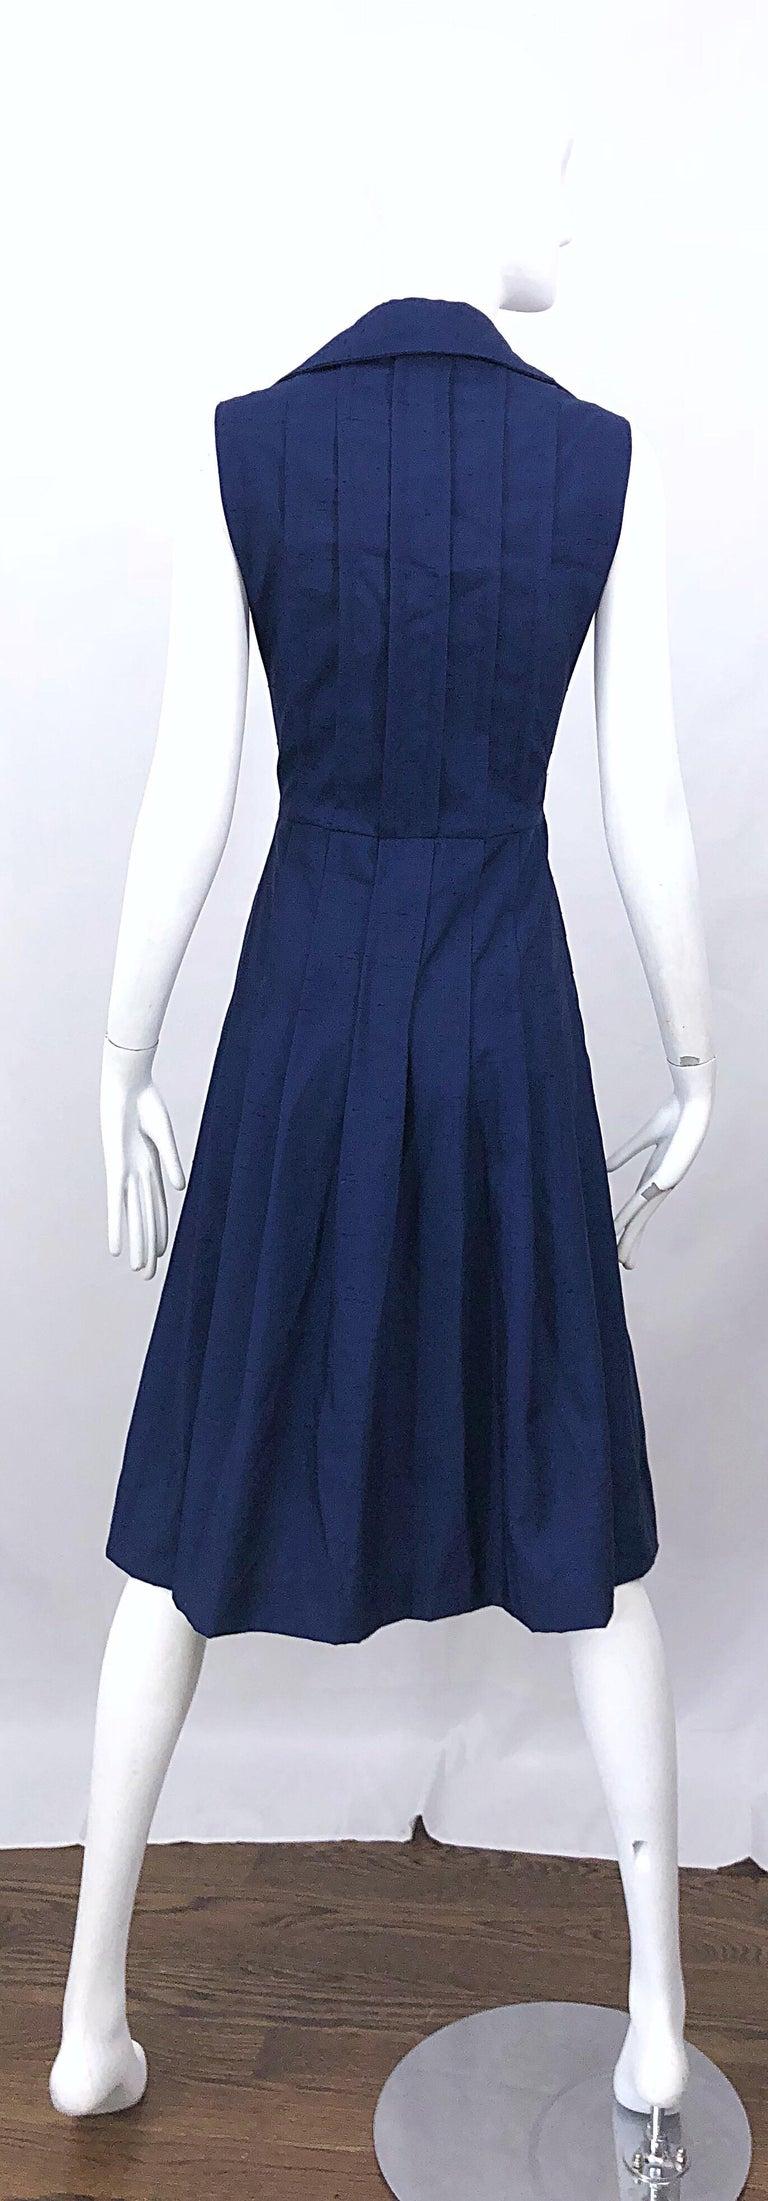 Women's 1990s Saks 5th Avenue Size 10 Navy Blue Silk Vintage 90s Sleeveless Shirt Dress For Sale